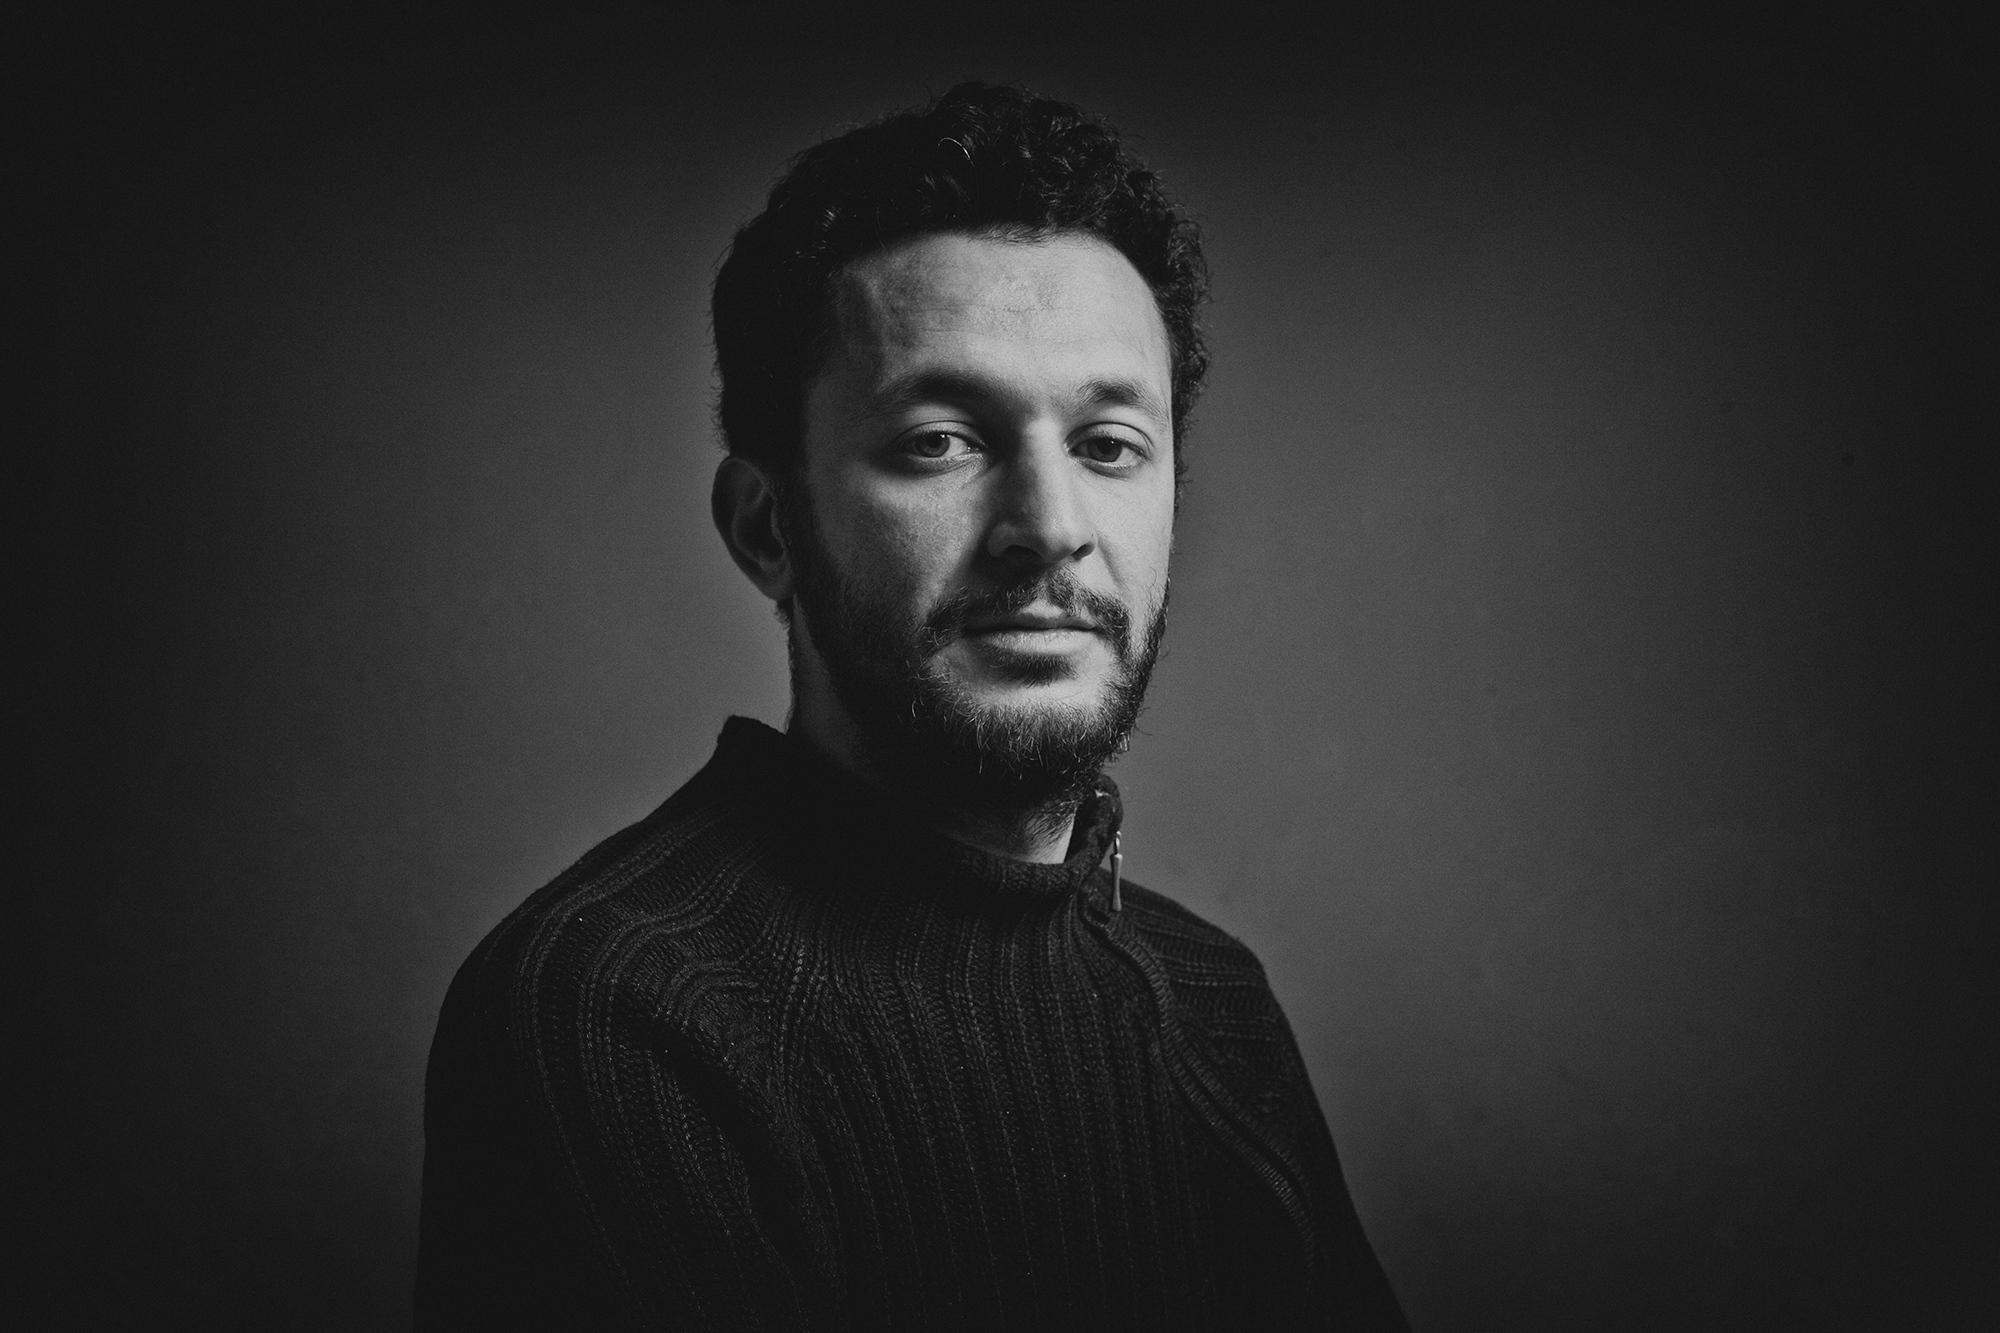 © Aymen Omrani, Zied Ben Romdhane